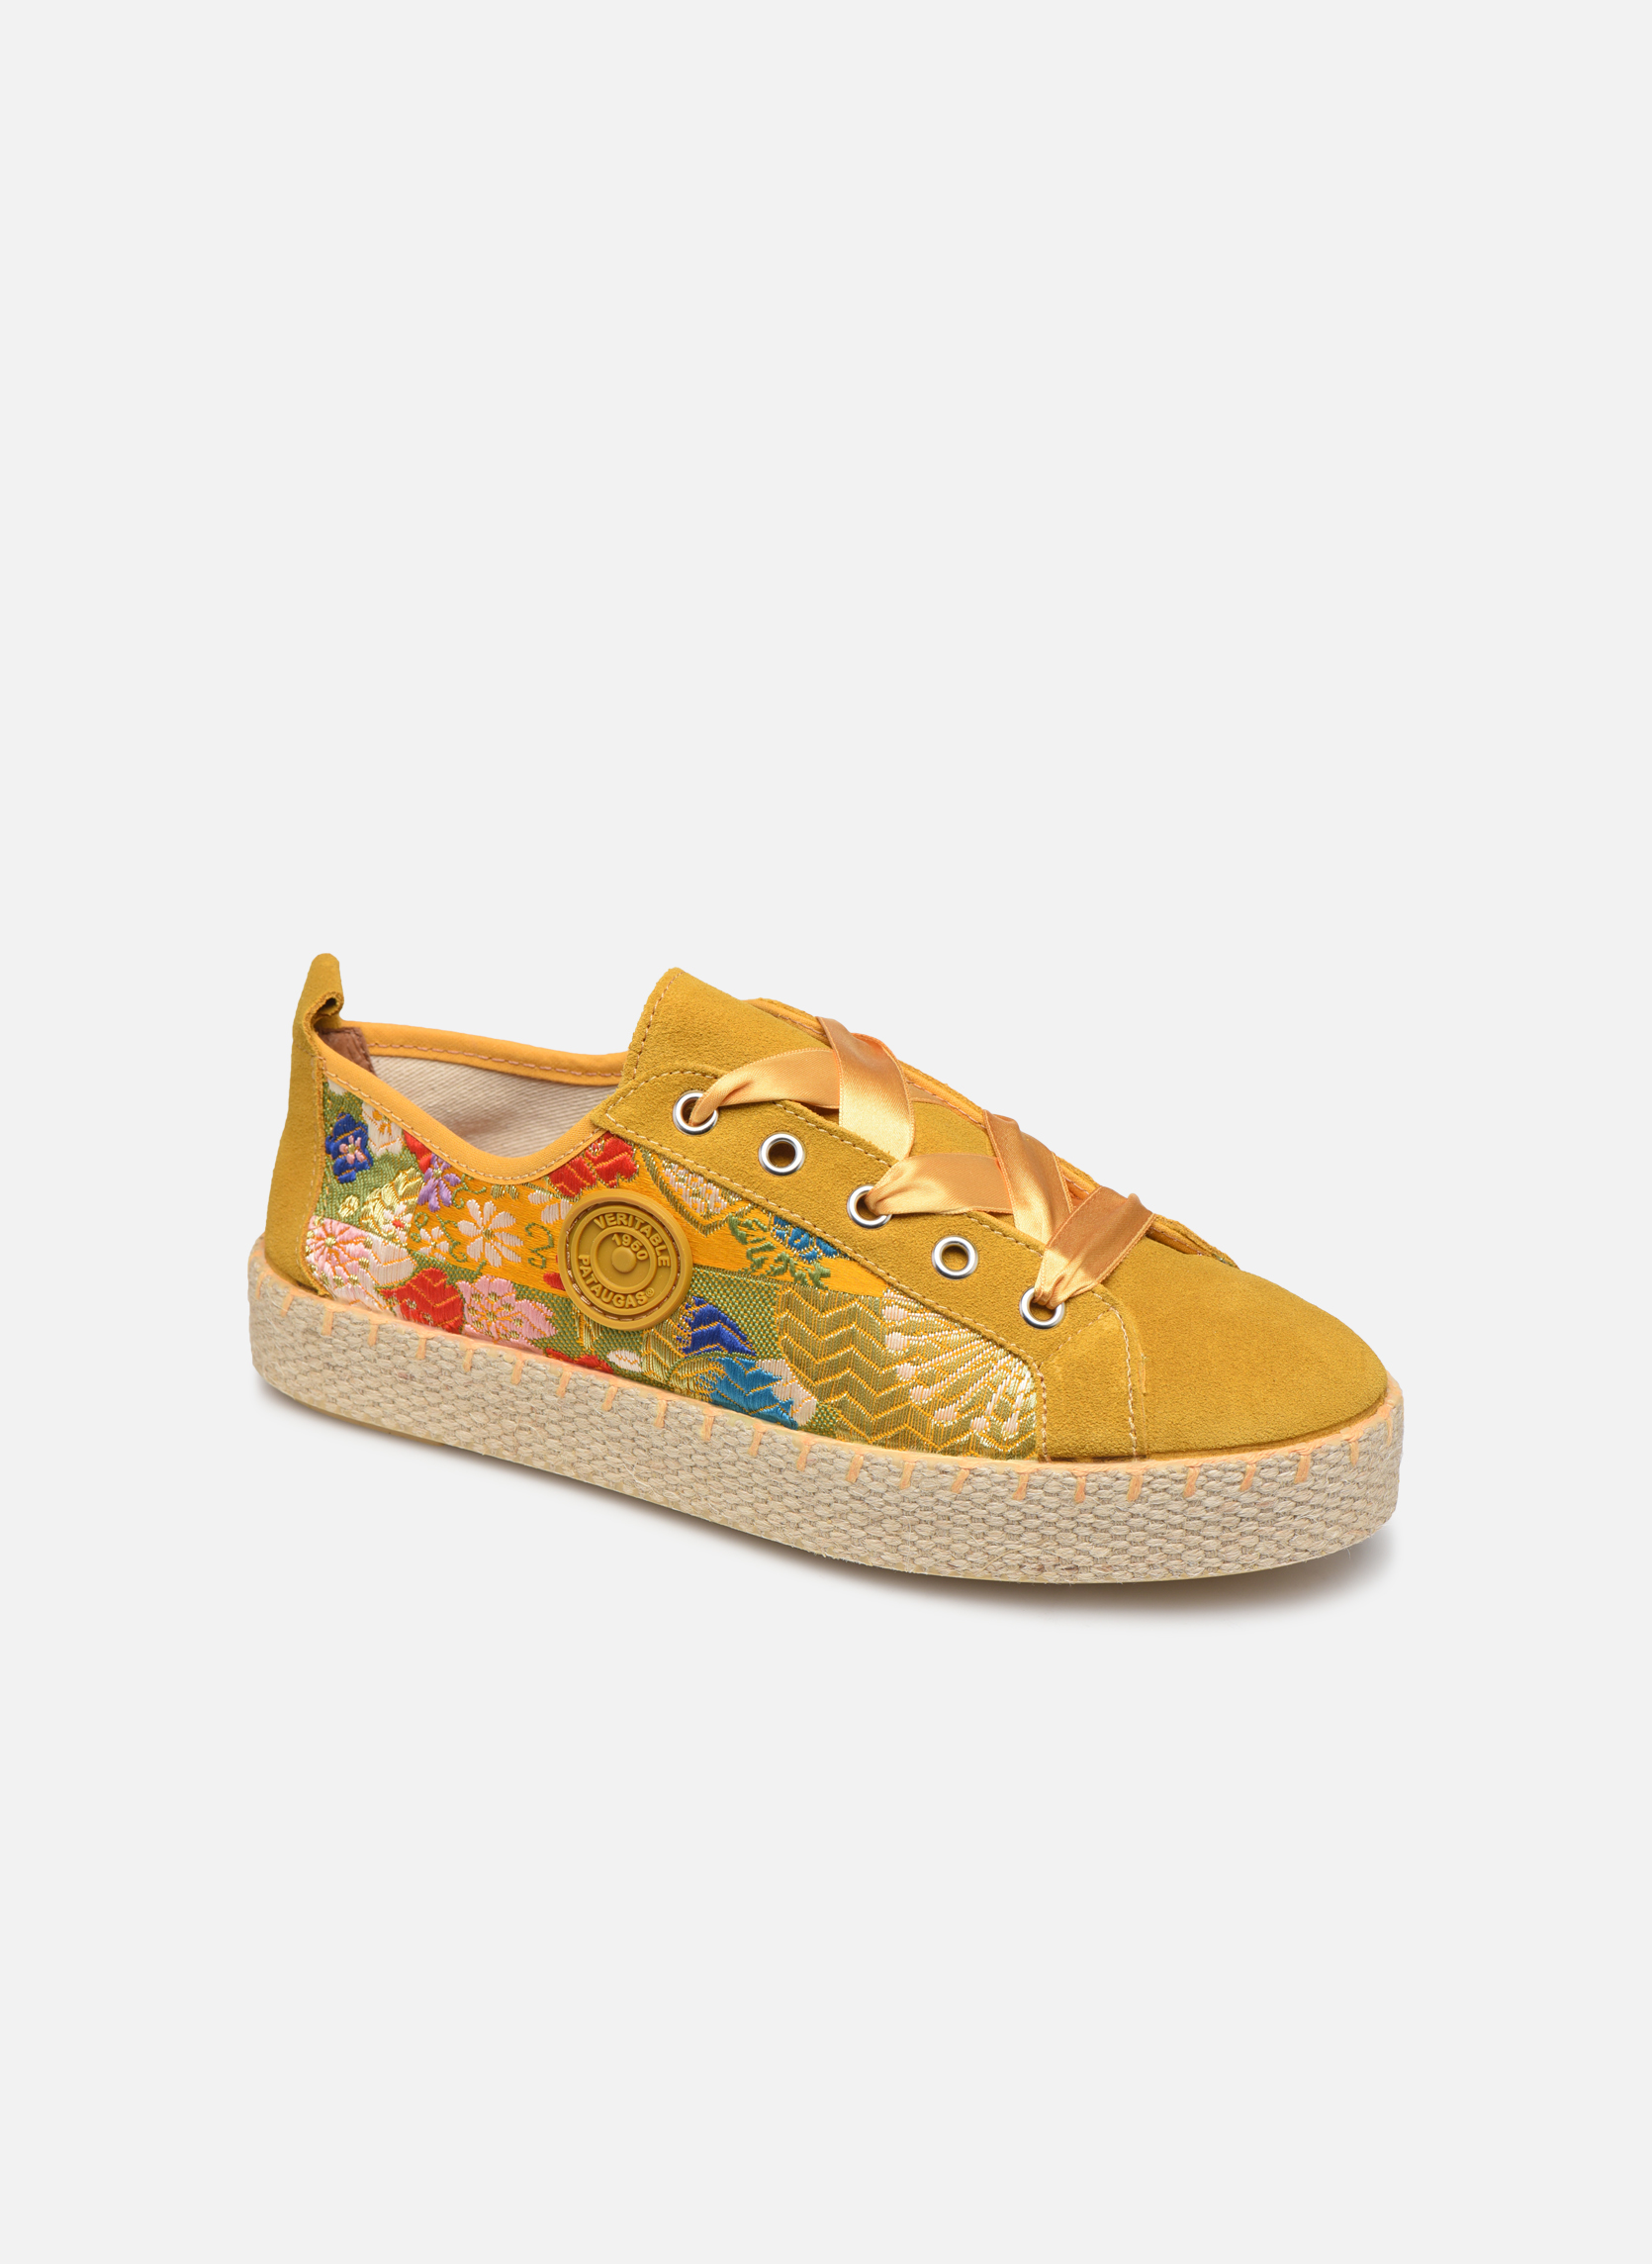 Sneakers Panke C by Pataugas